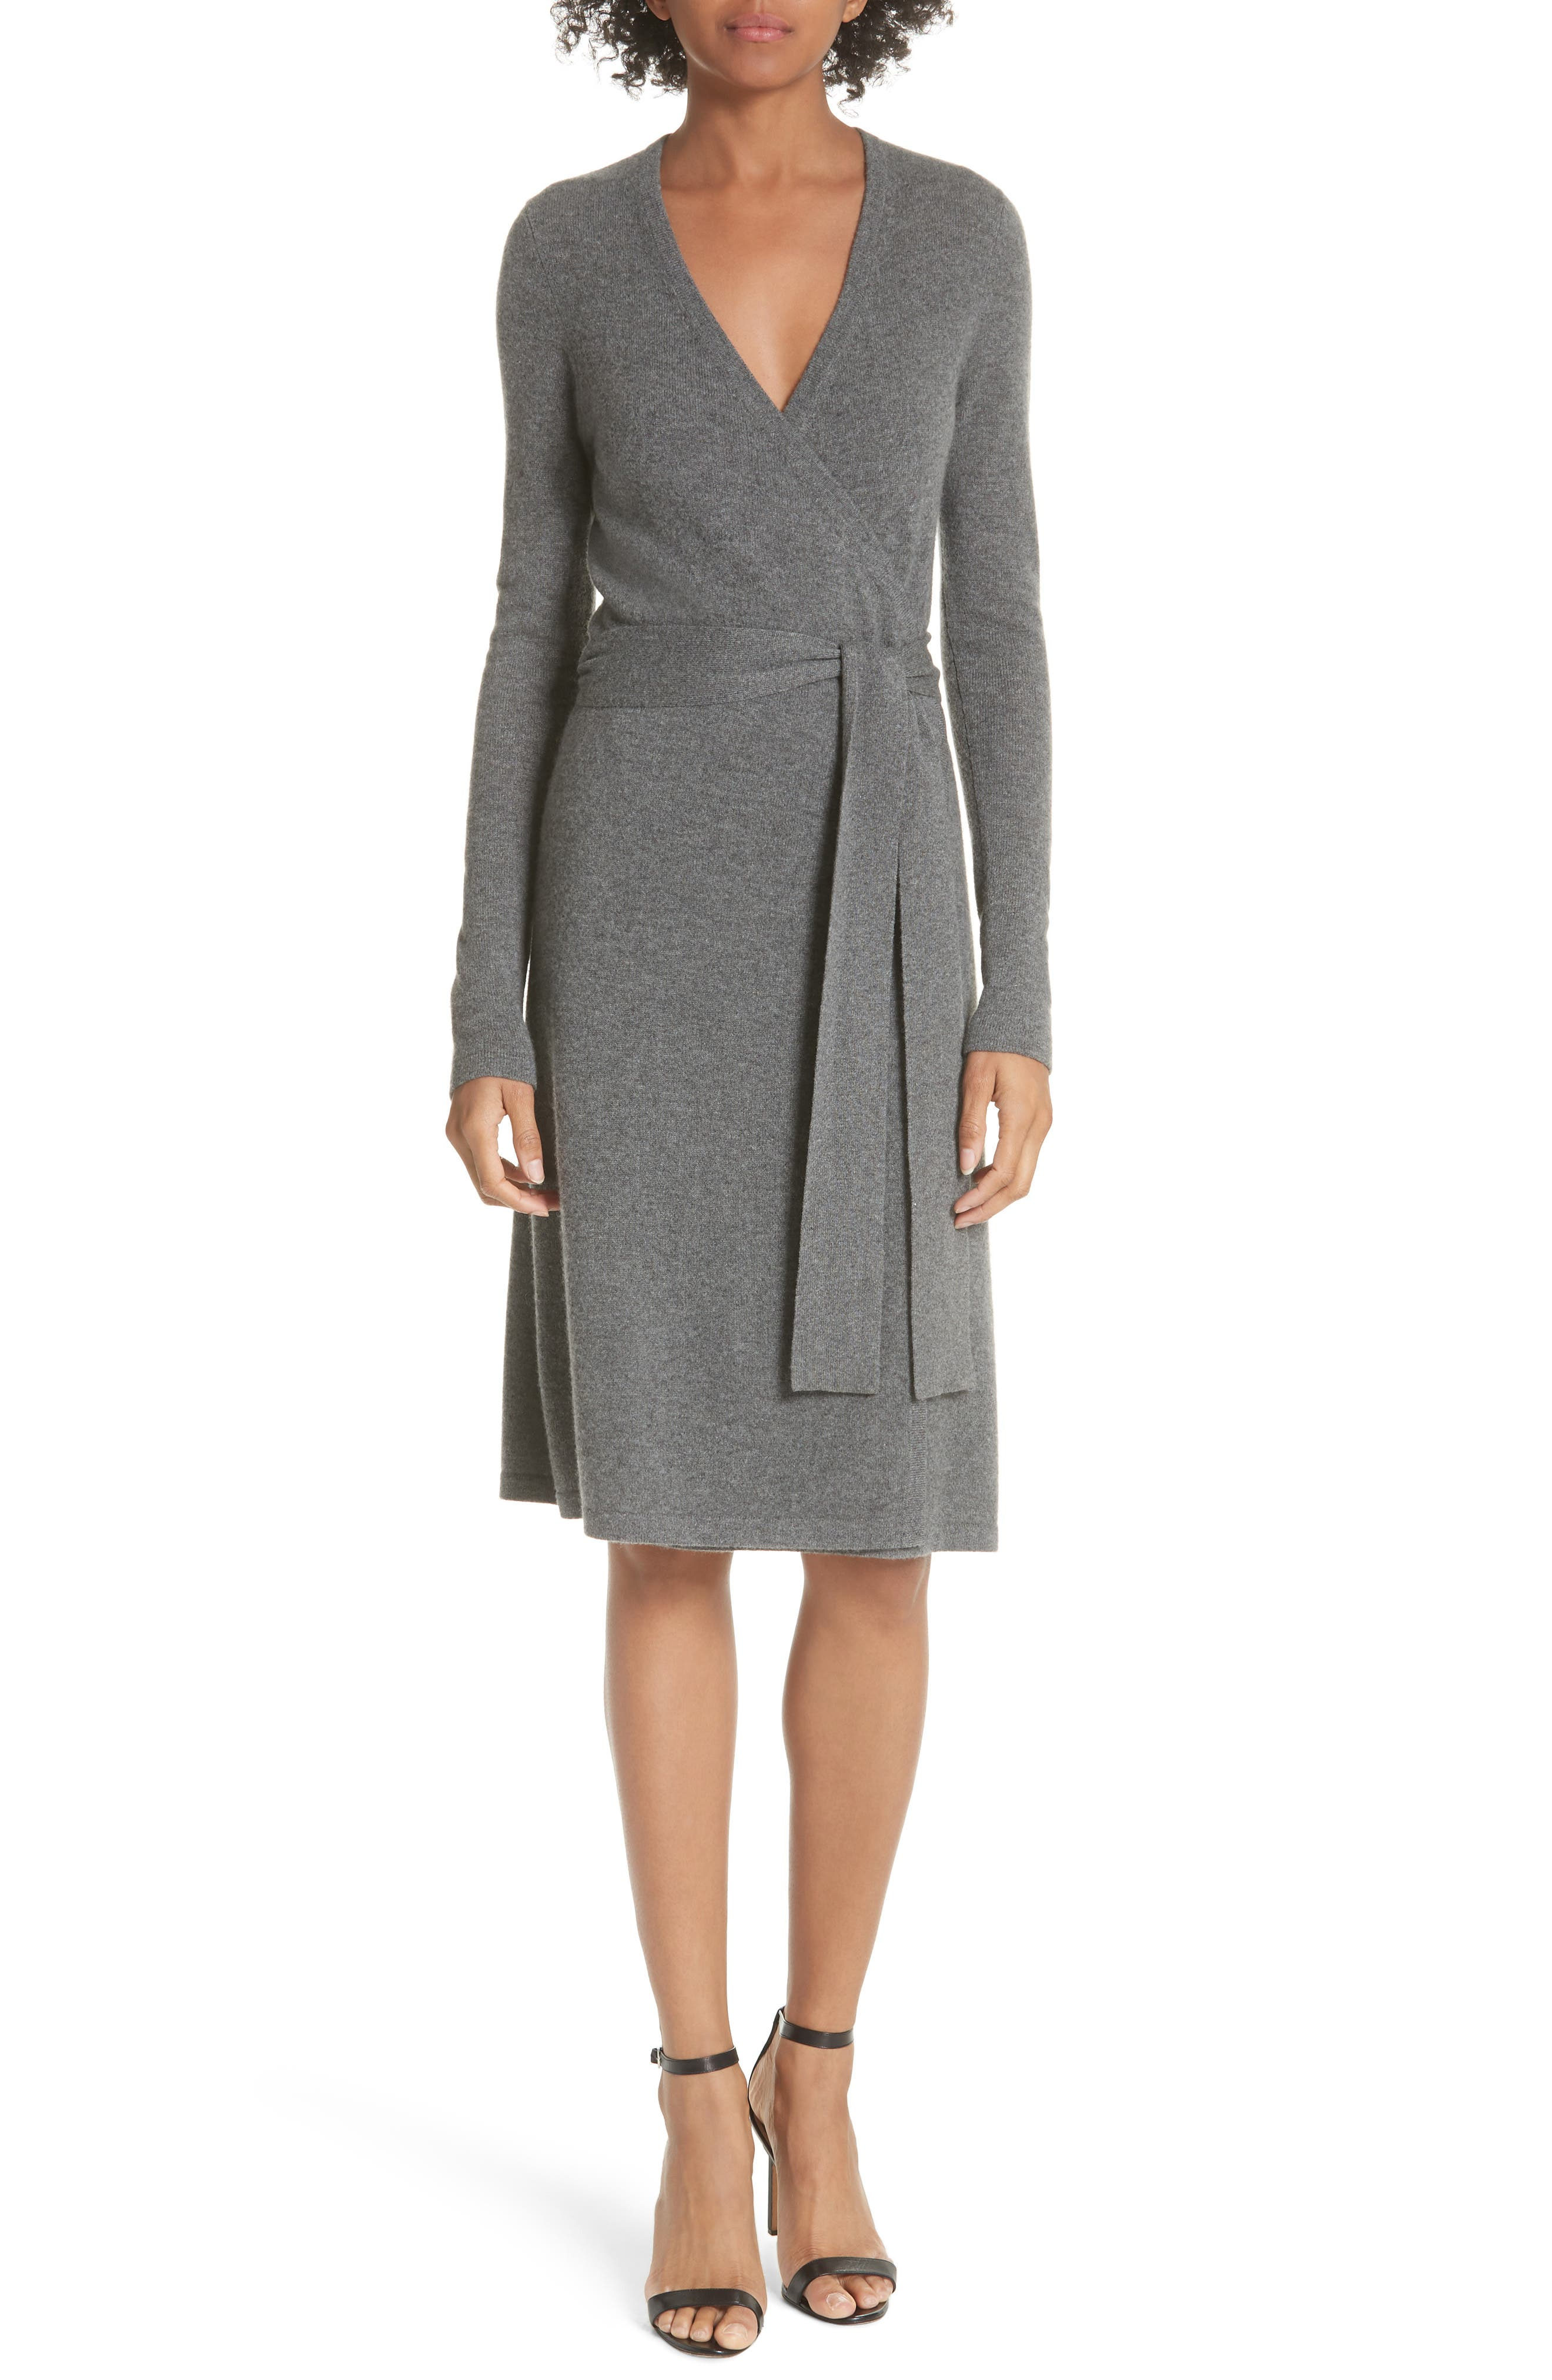 Diane Von Furstenberg Linda Cashmere Wrap Dress,                         Main,                         color, 001